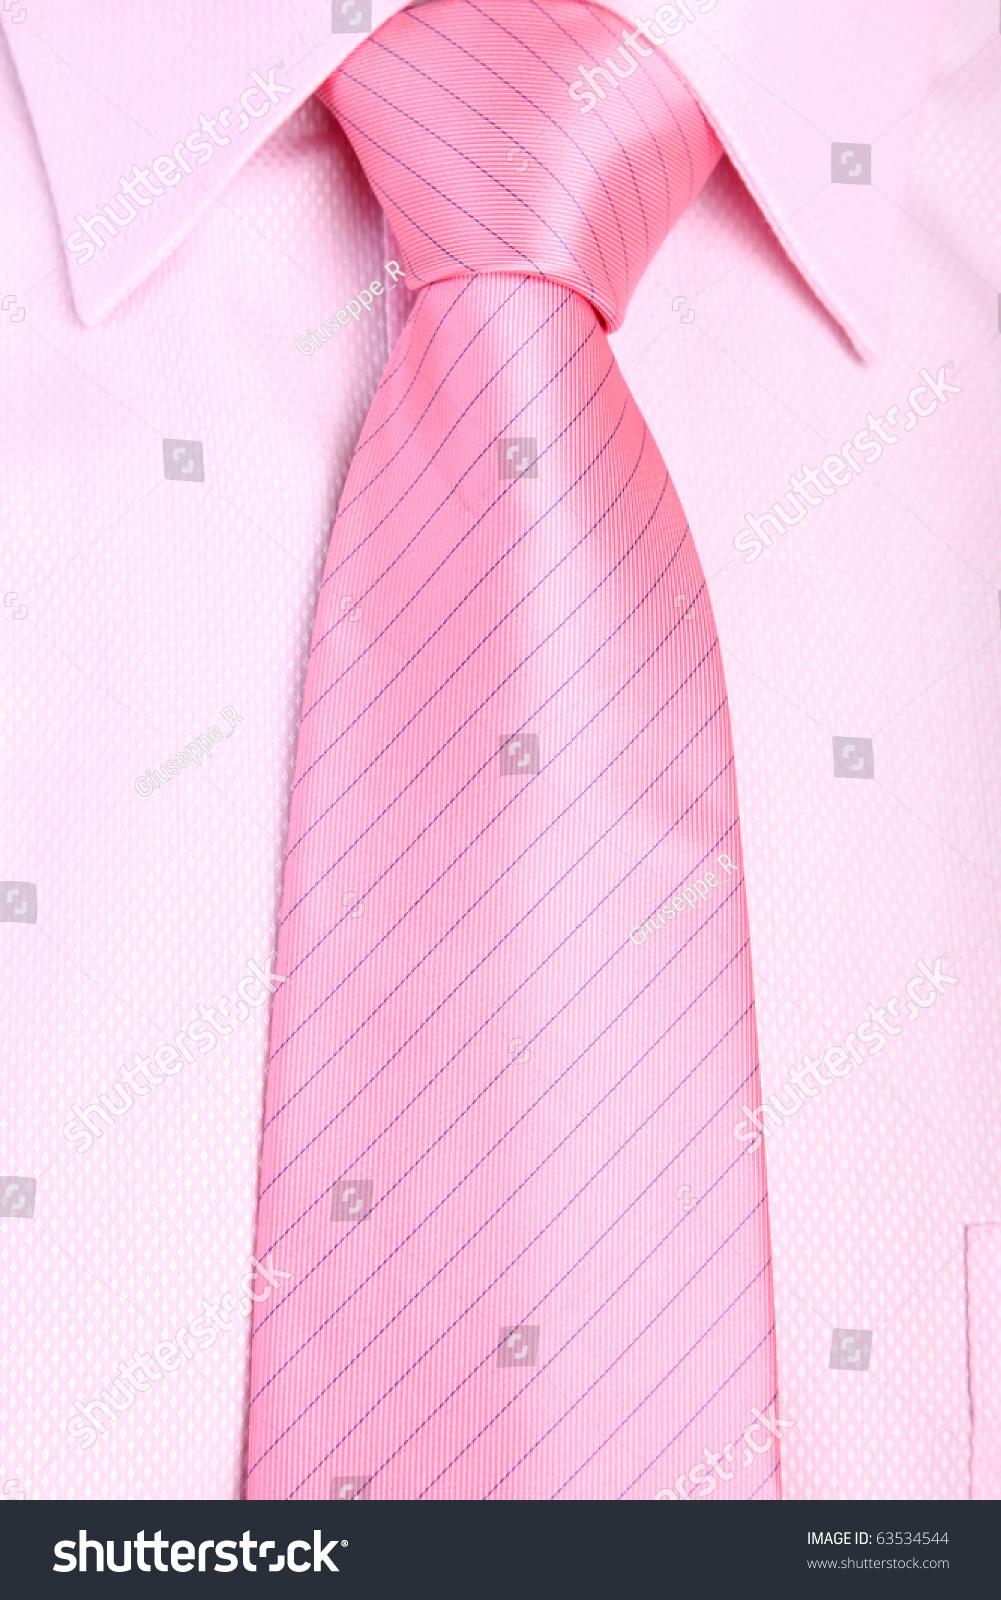 Tie Pink Shirt Close Up Smart Stock Photo 63534544 - Shutterstock